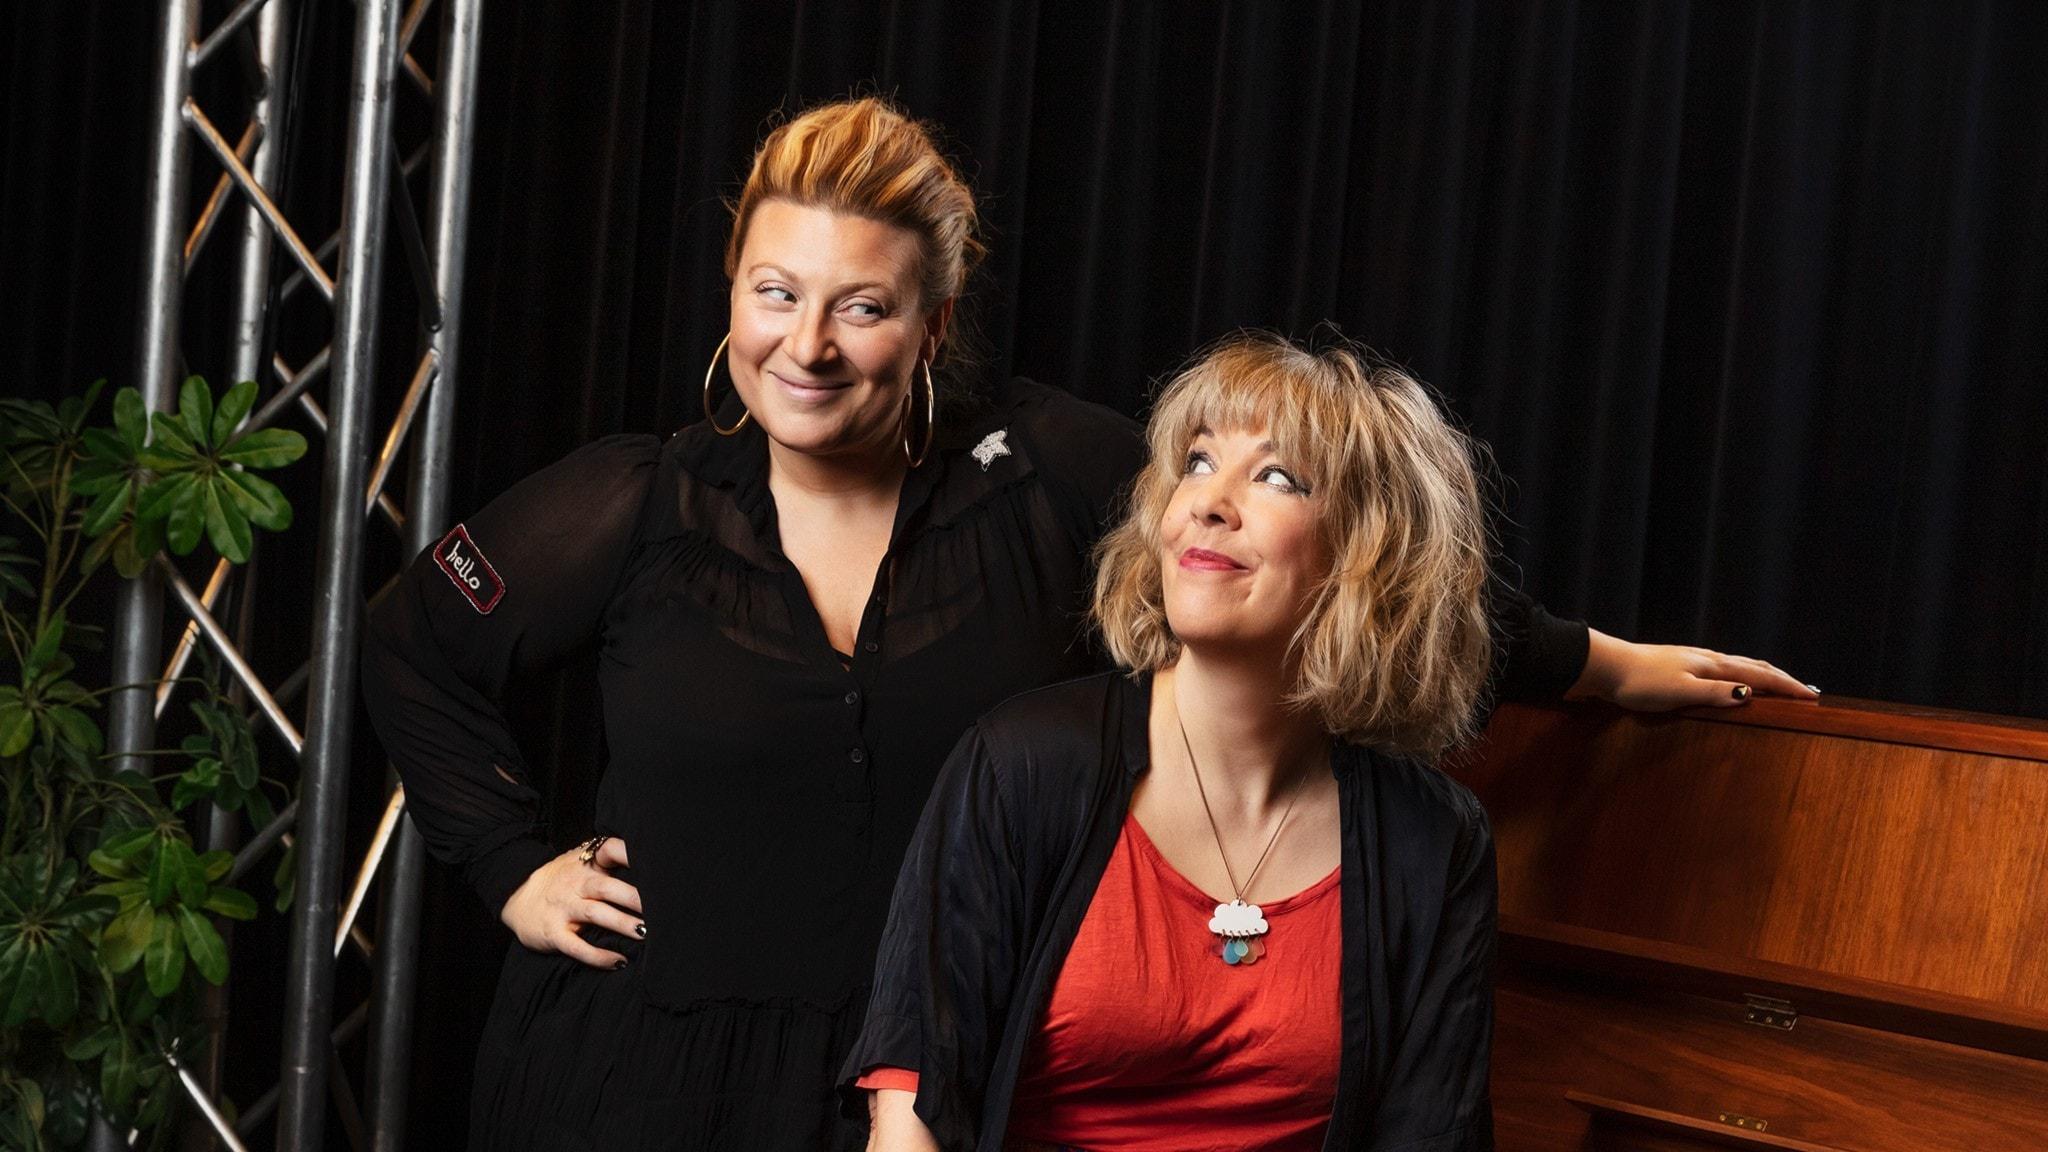 Backstage med Marit Bergman Marit Bergman träffar Sarah Dawn Finer P4 Live: Backstage  P4 Sveriges Radio